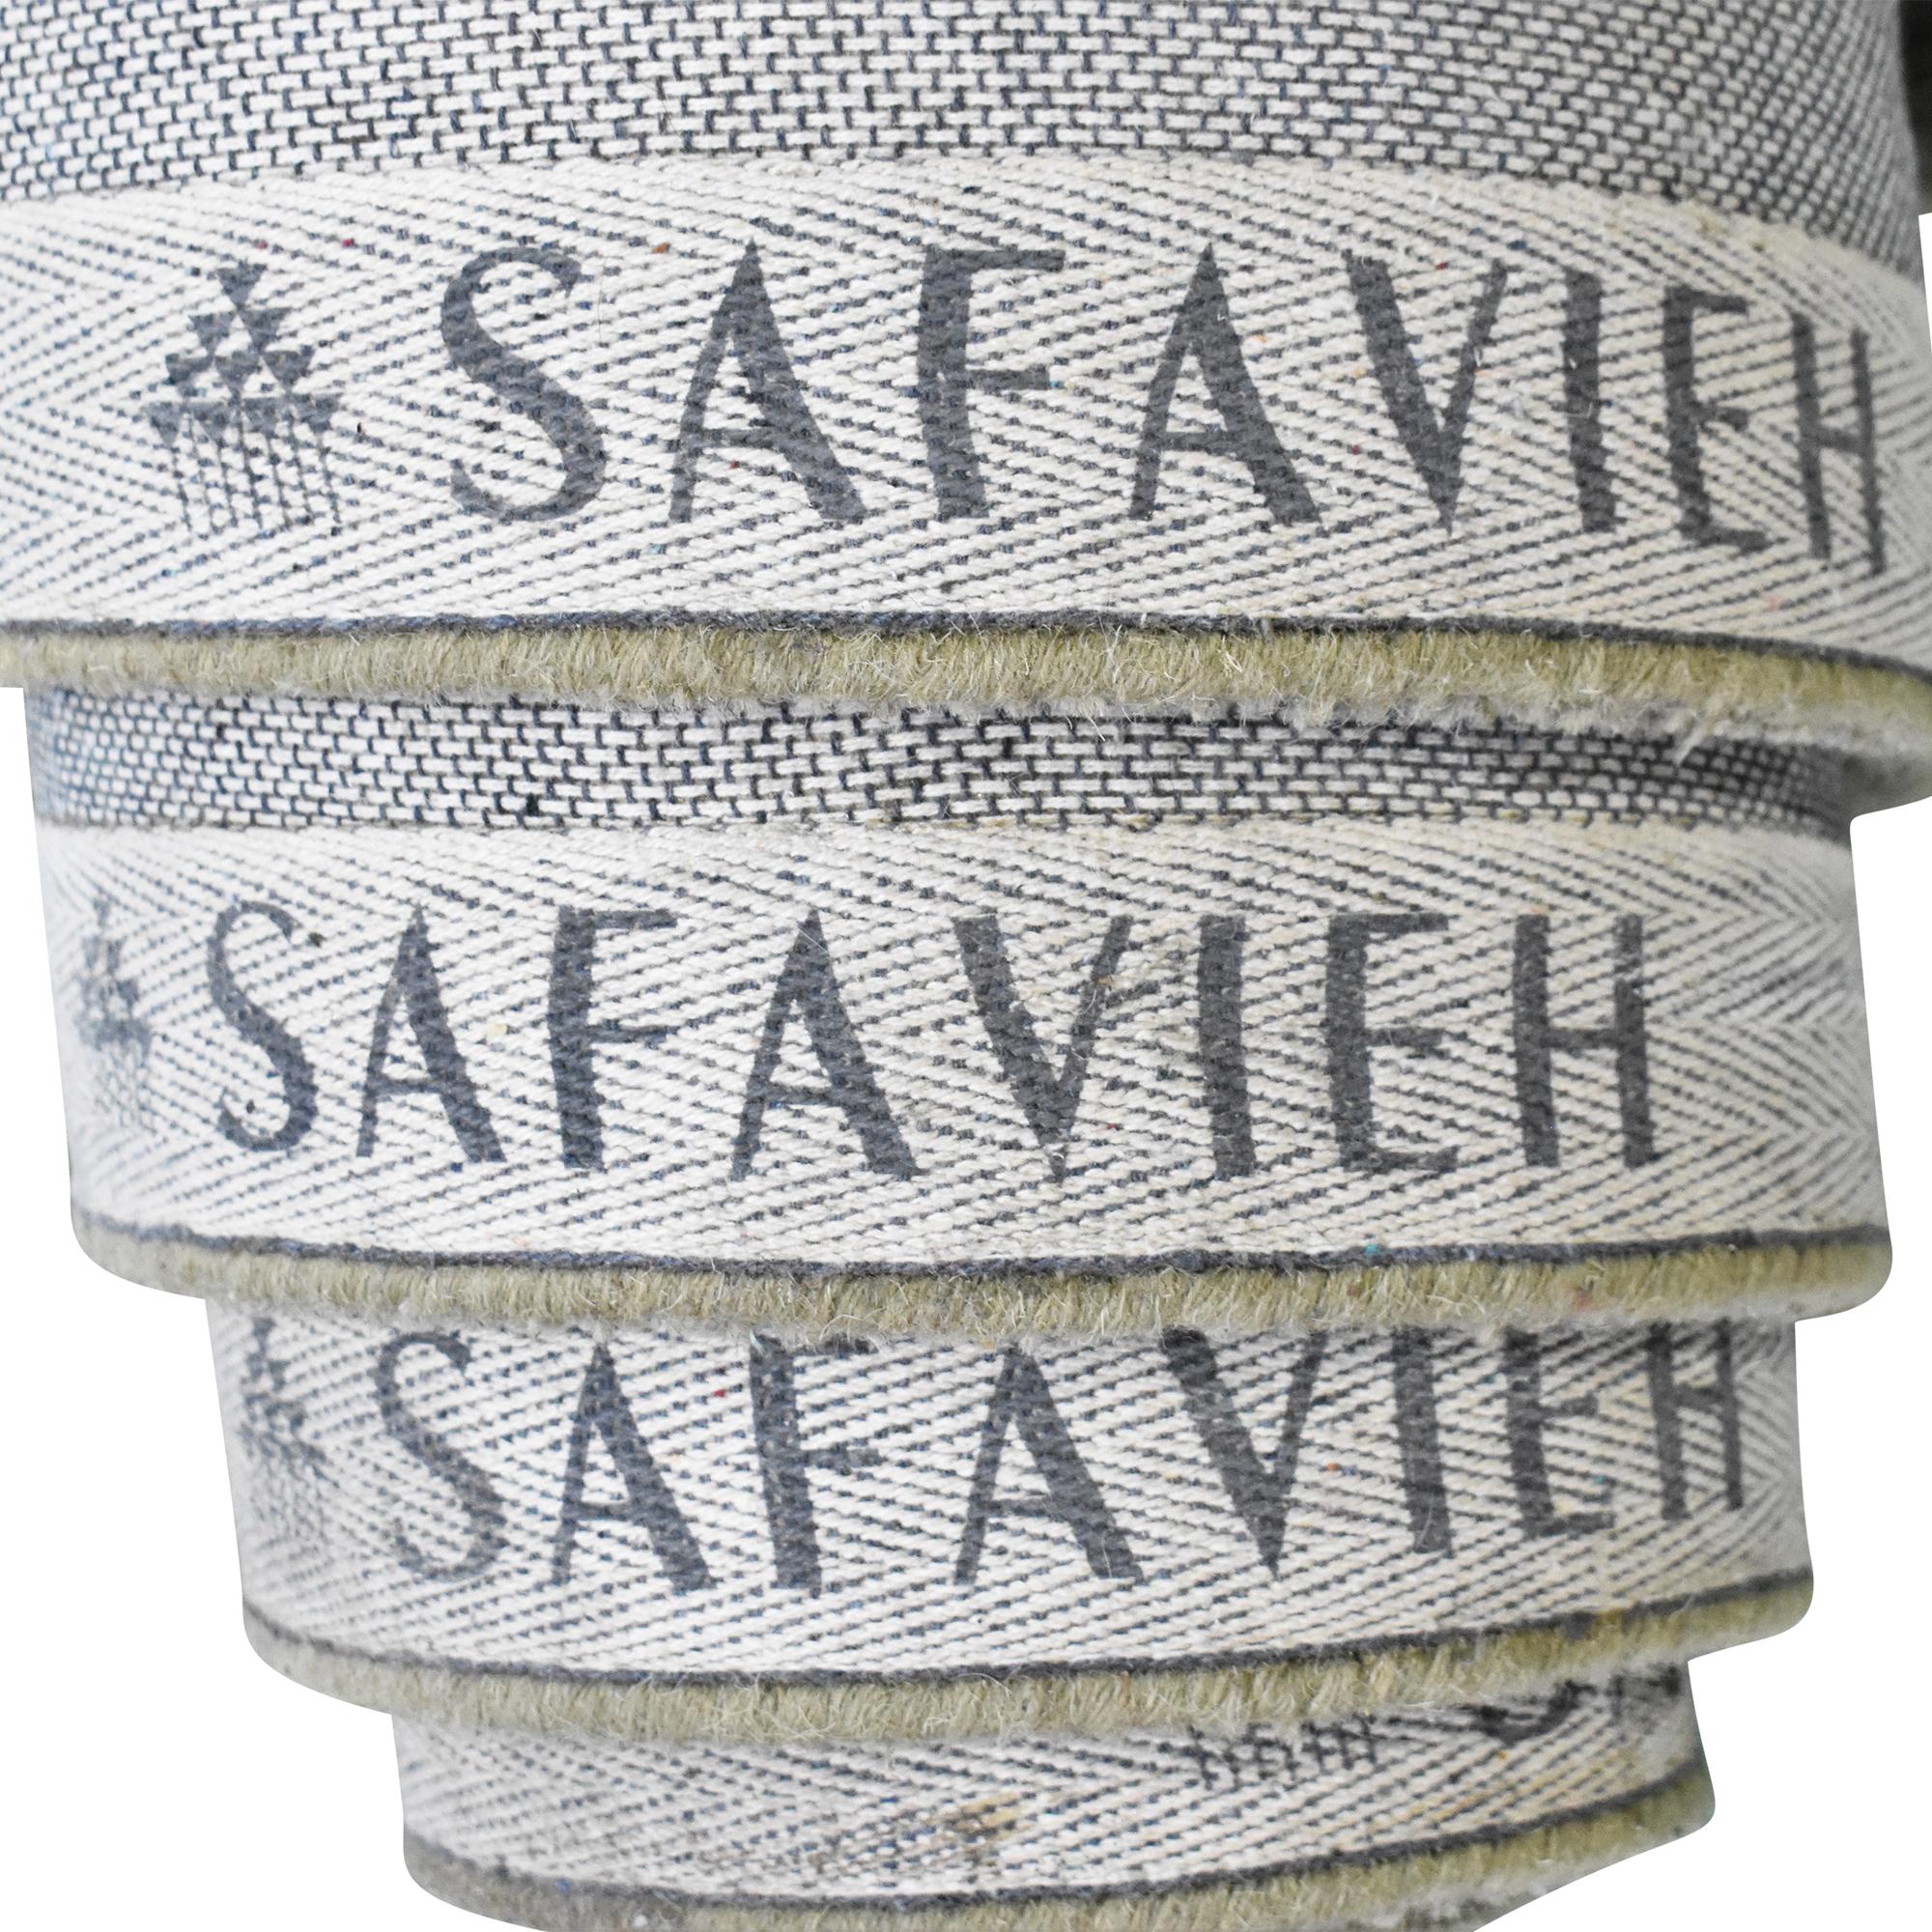 Safavieh Safavieh Classic Collection Area Rug ma